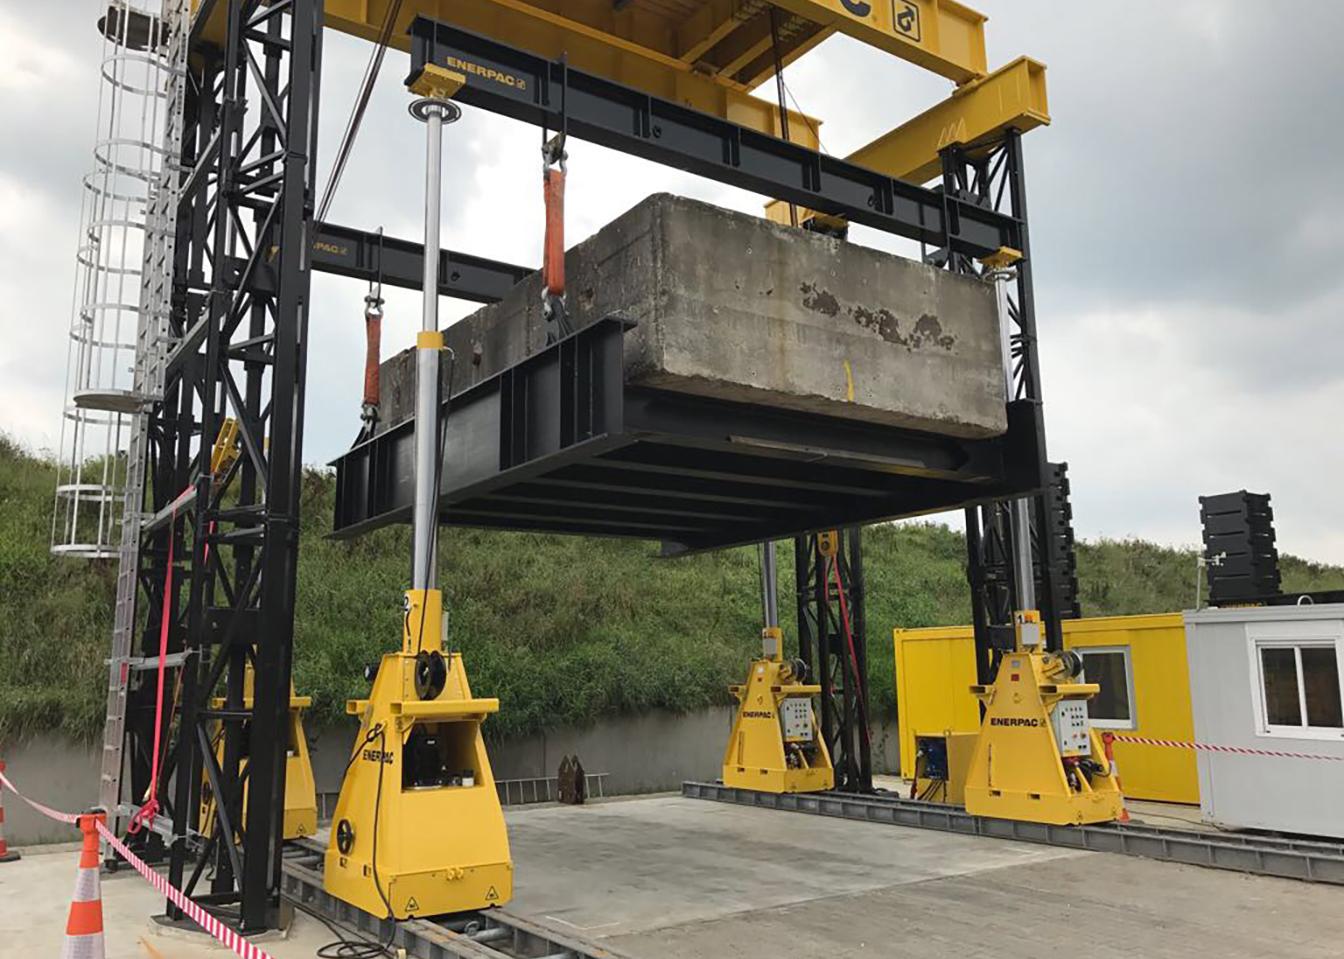 Hydraulic Lift Project : Increasing hydraulic lift capacity to tons flegg